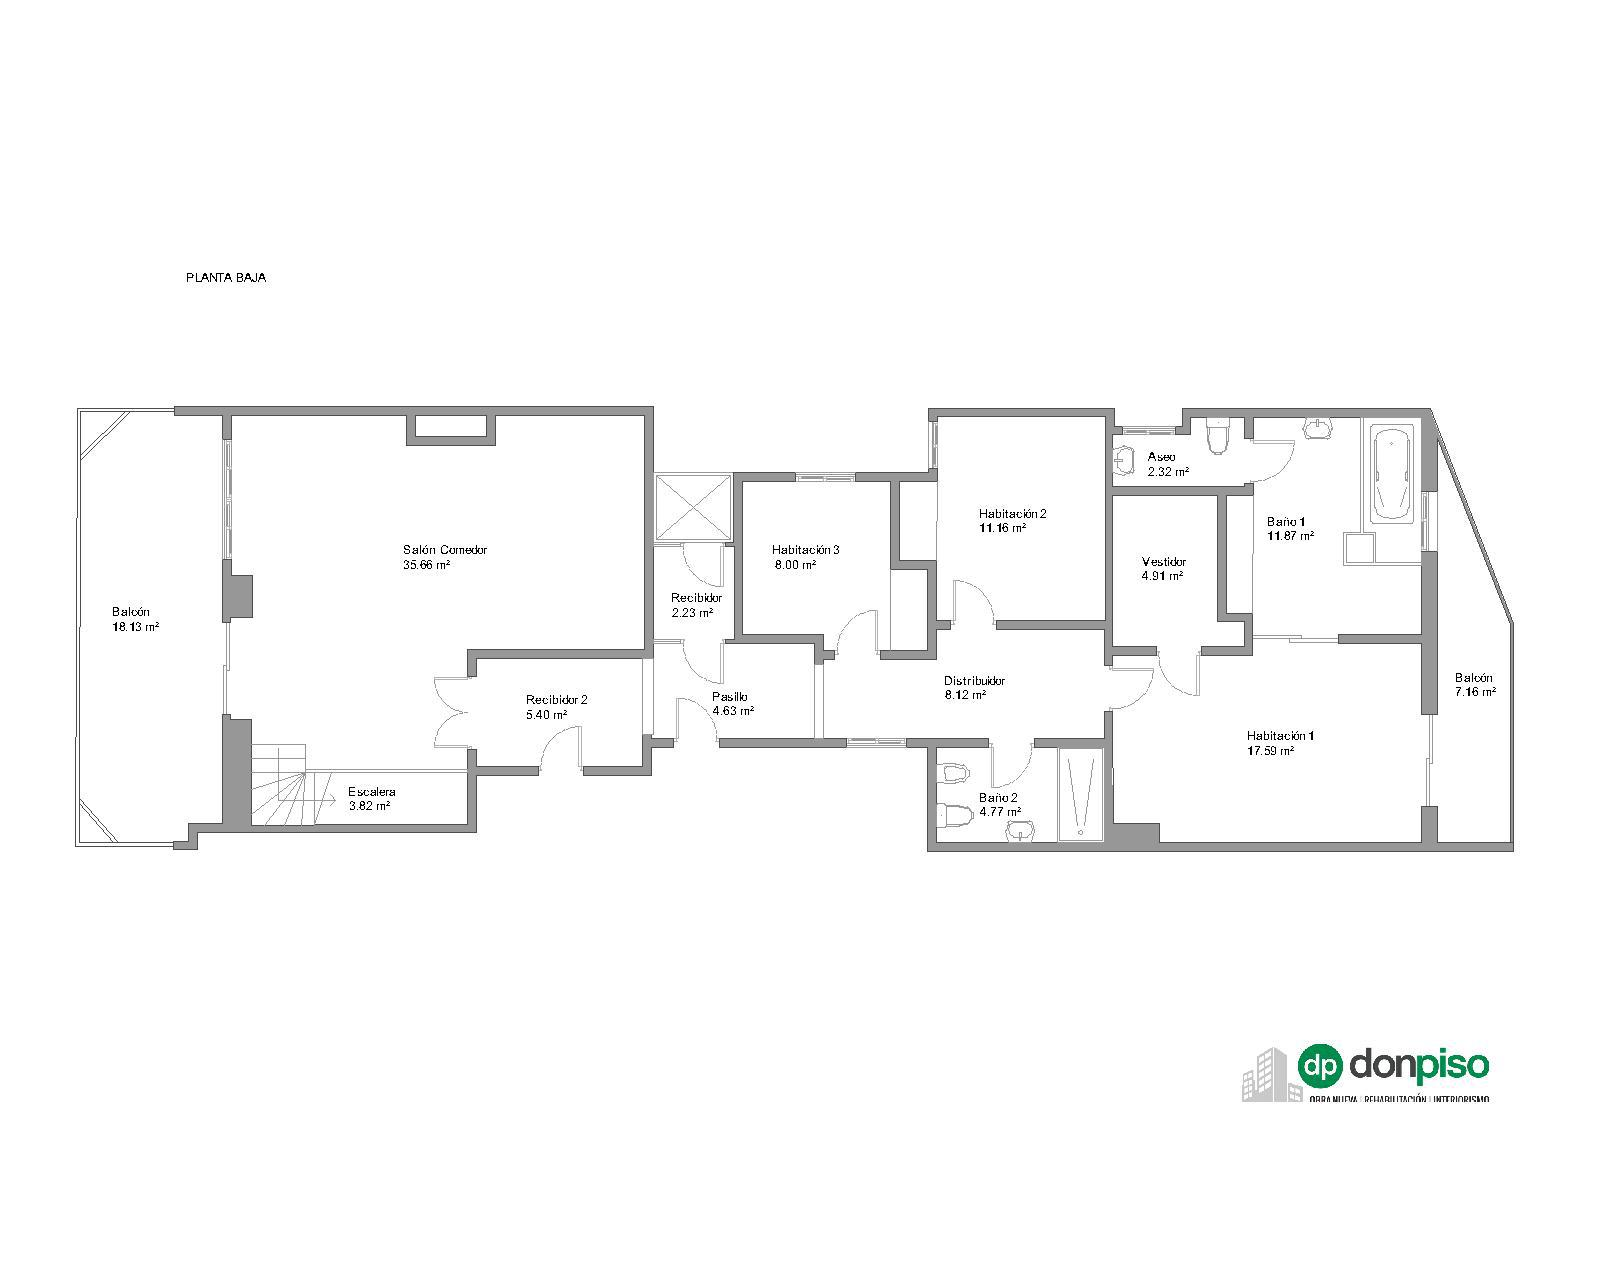 249314 Penthouse for sale in Sarrià-Sant Gervasi, Sant Gervasi-Galvany 34